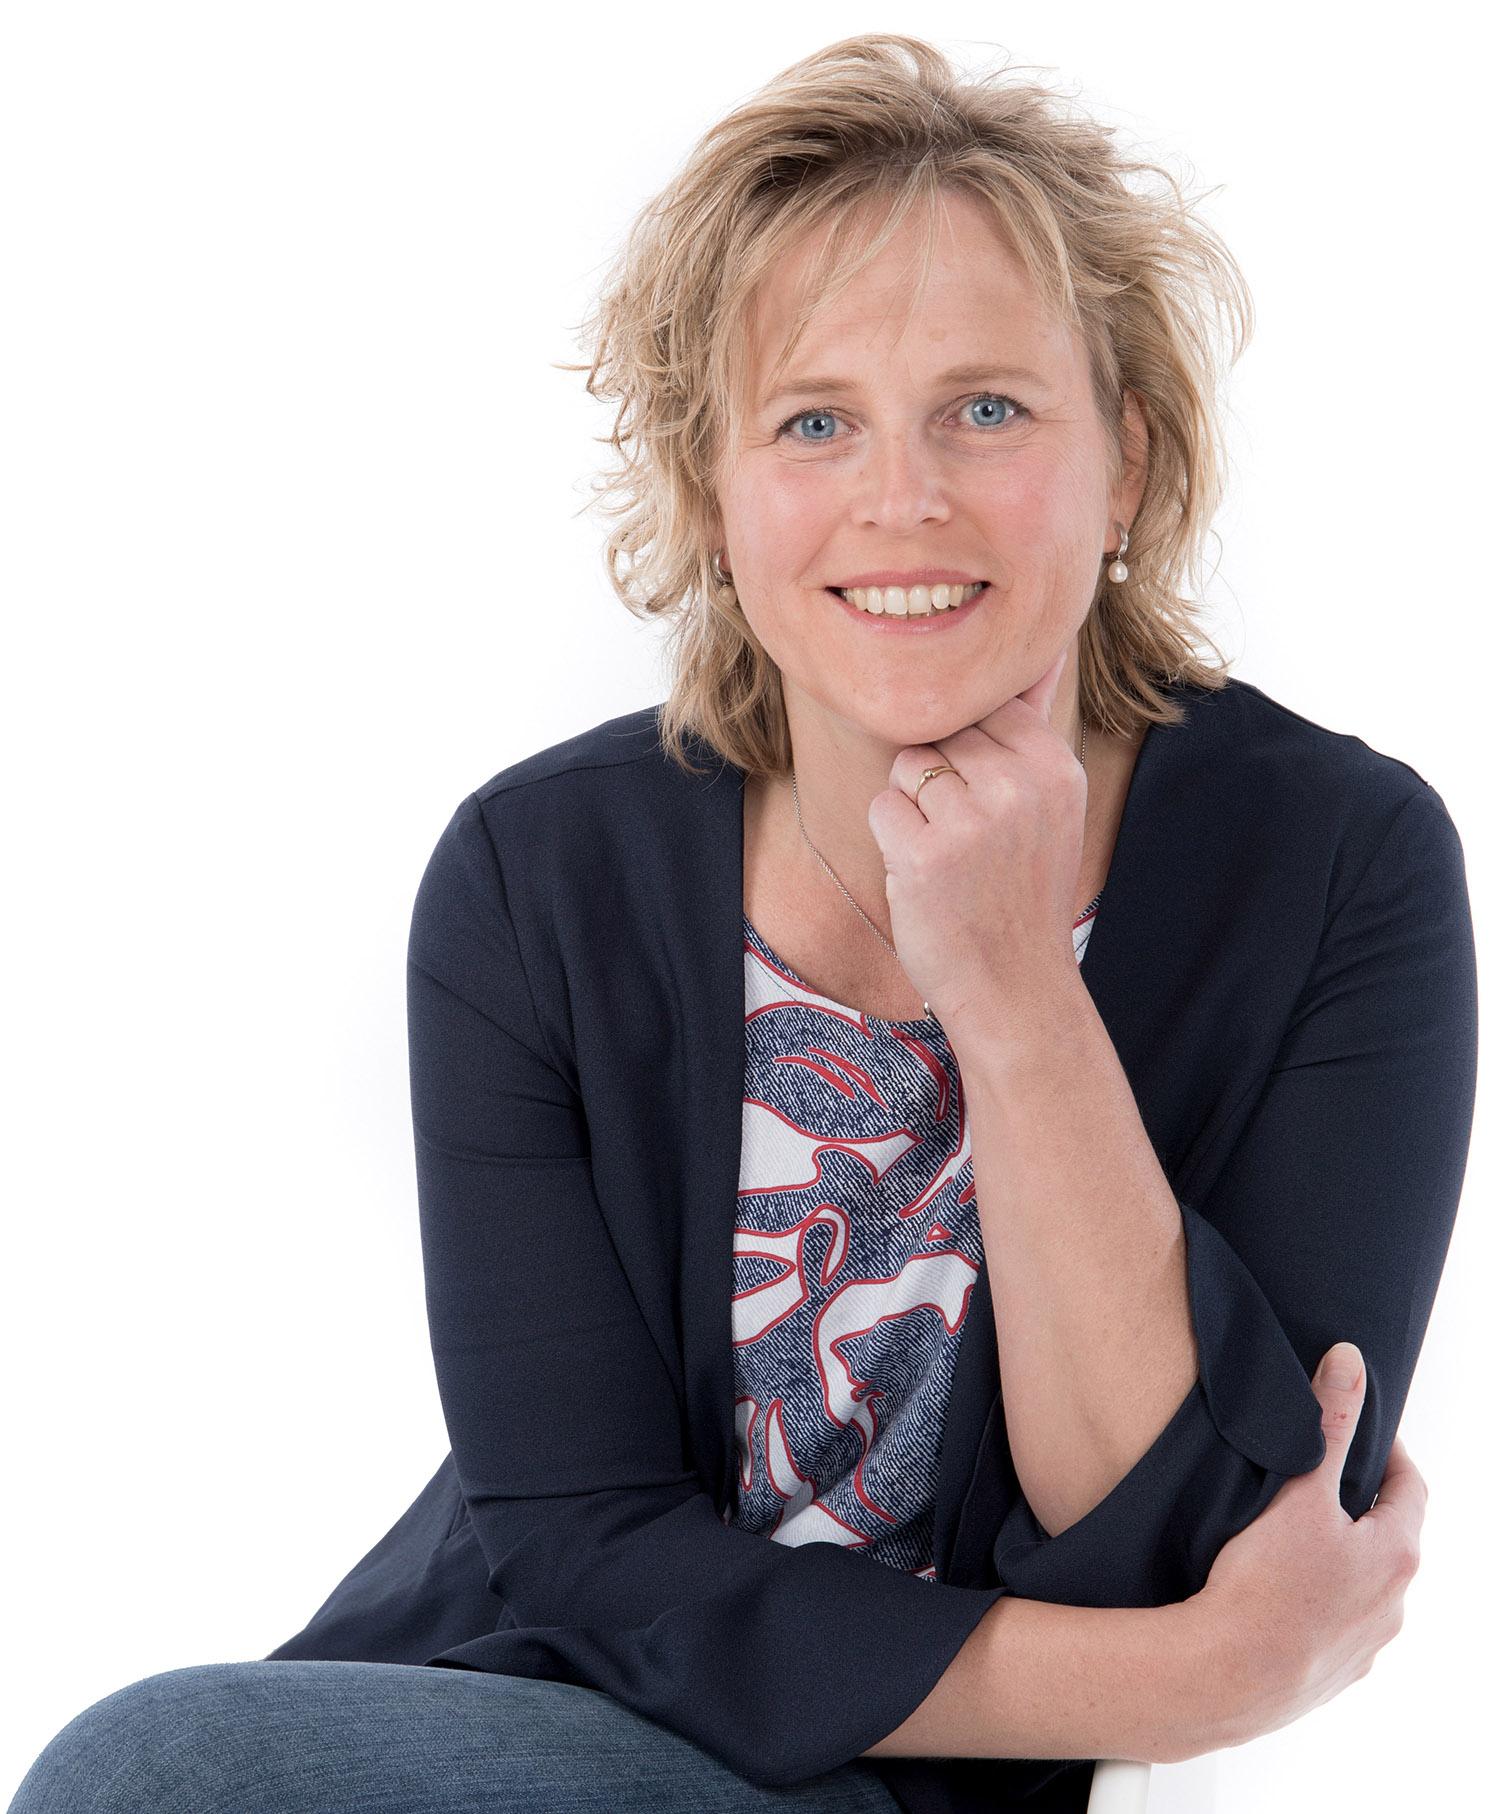 Janine Prins-Schouten